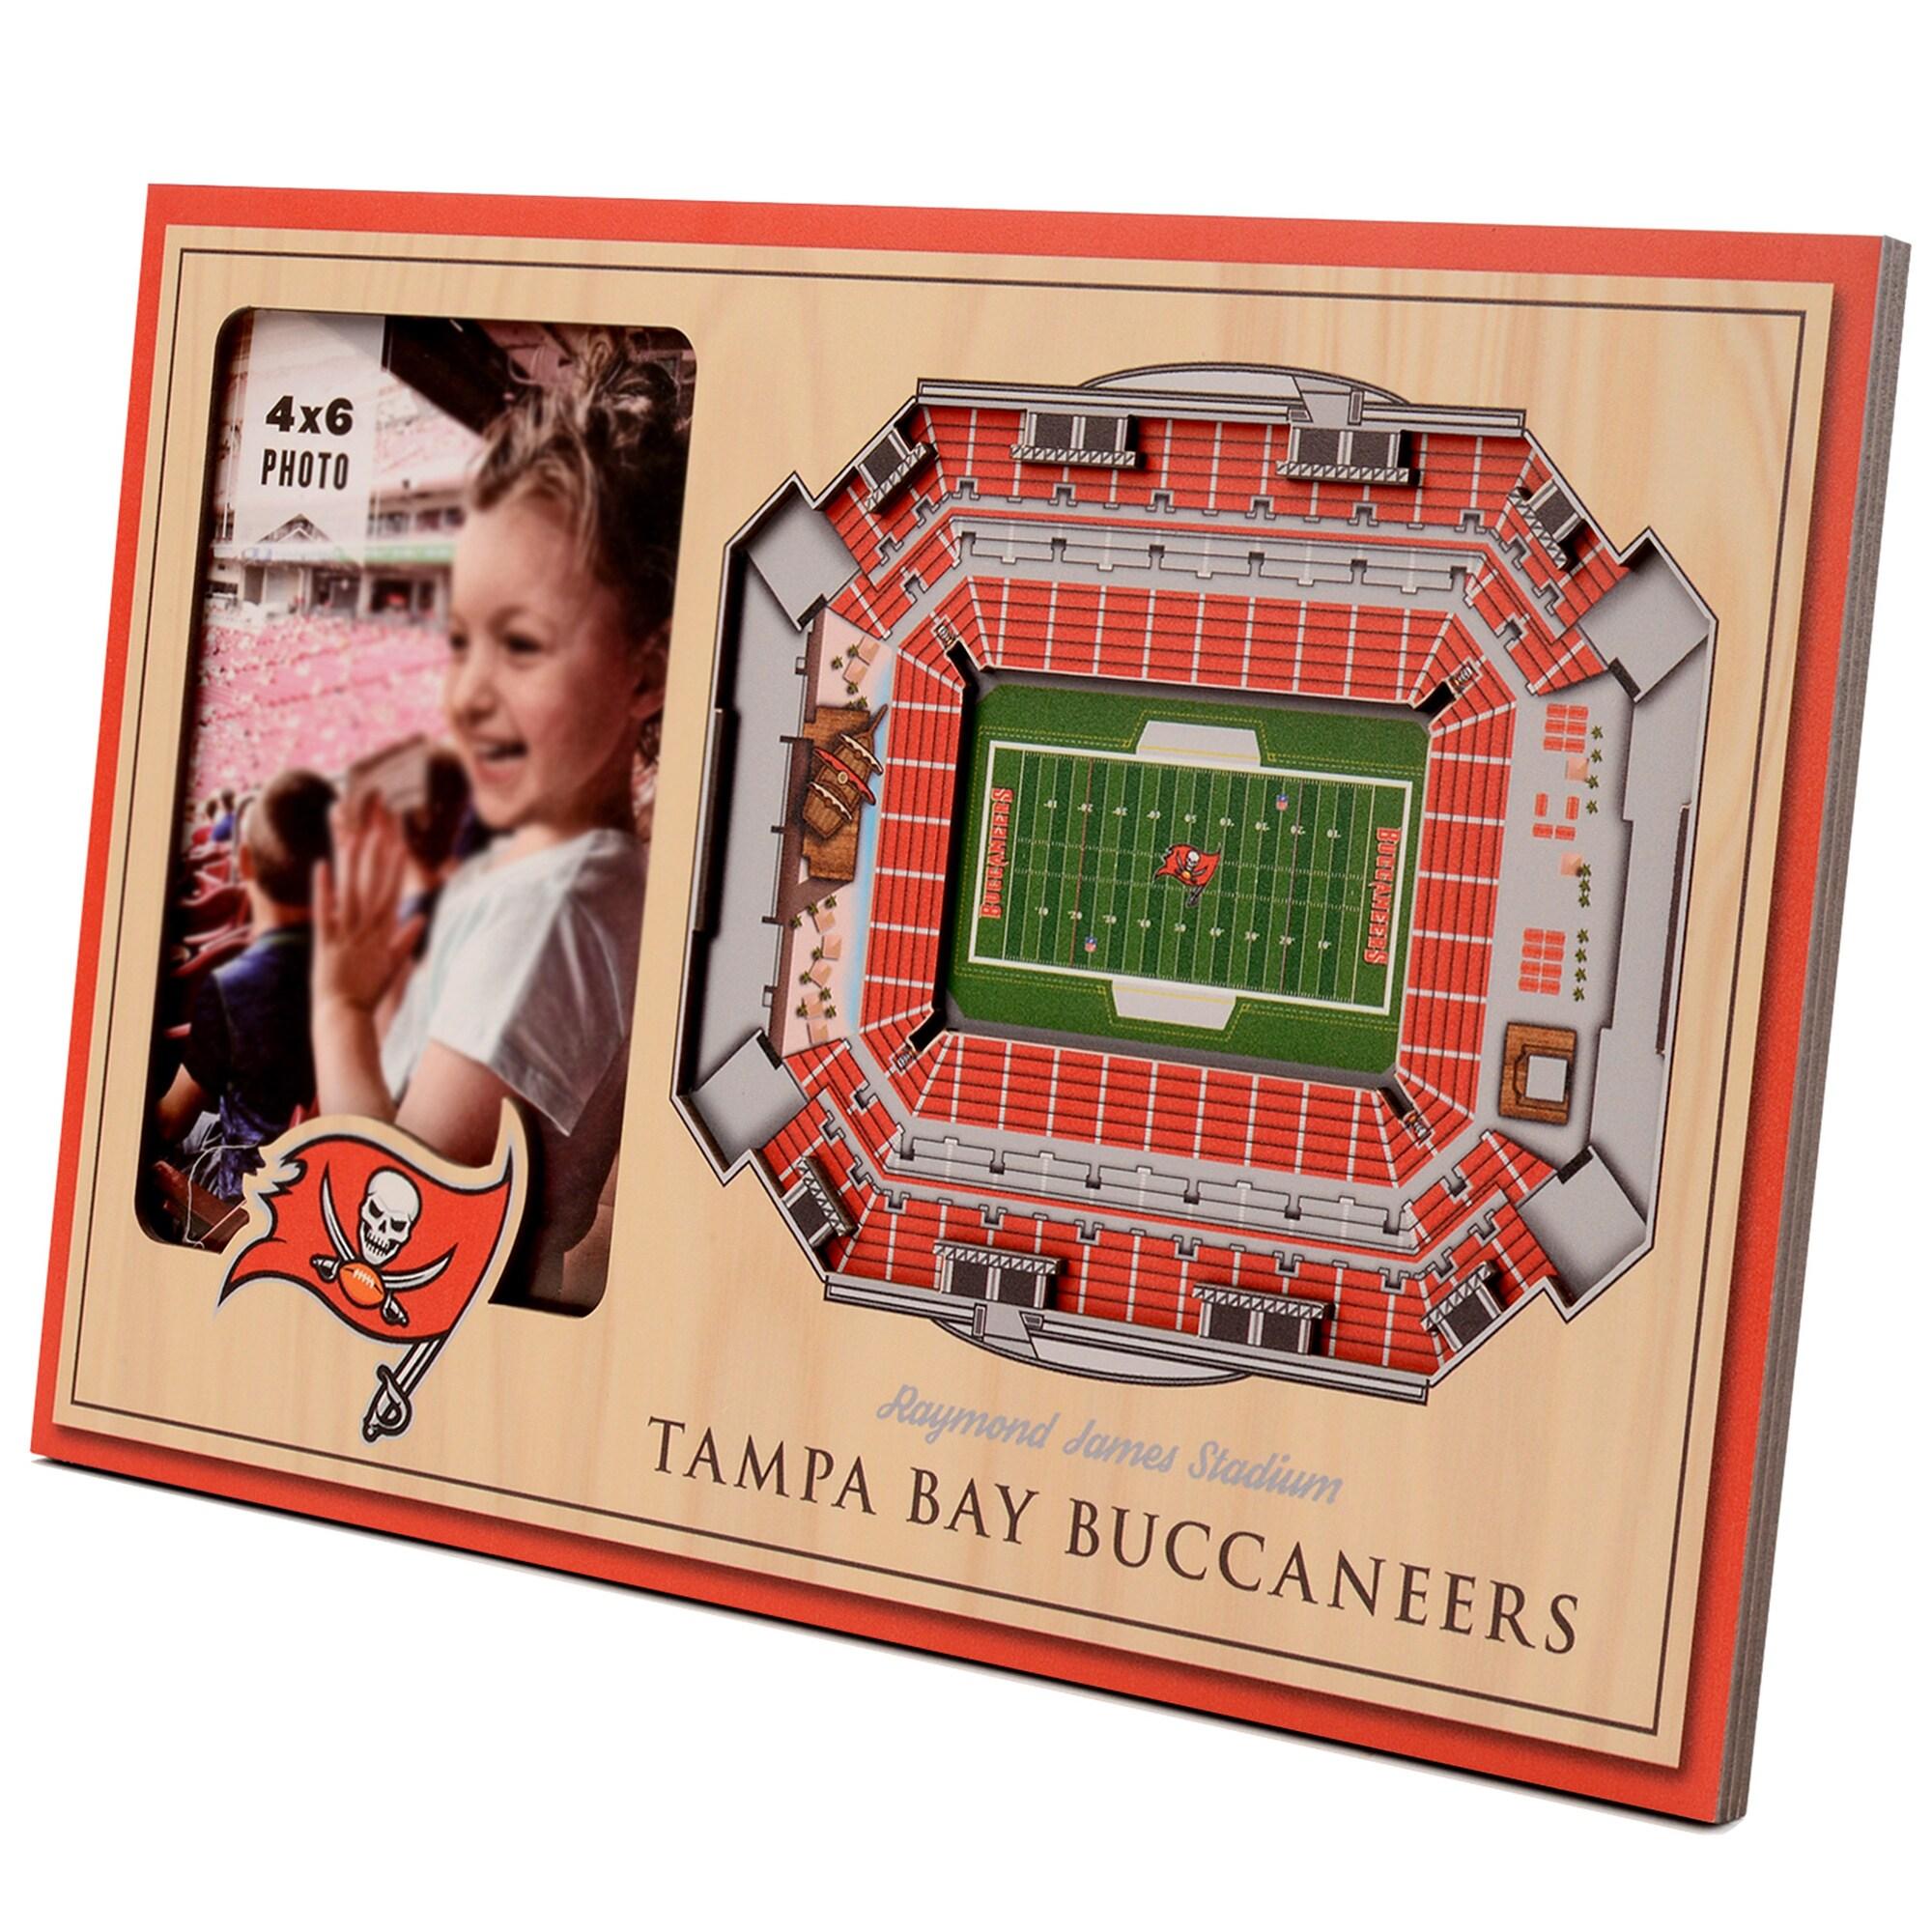 Tampa Bay Buccaneers 3D StadiumViews Picture Frame - Brown